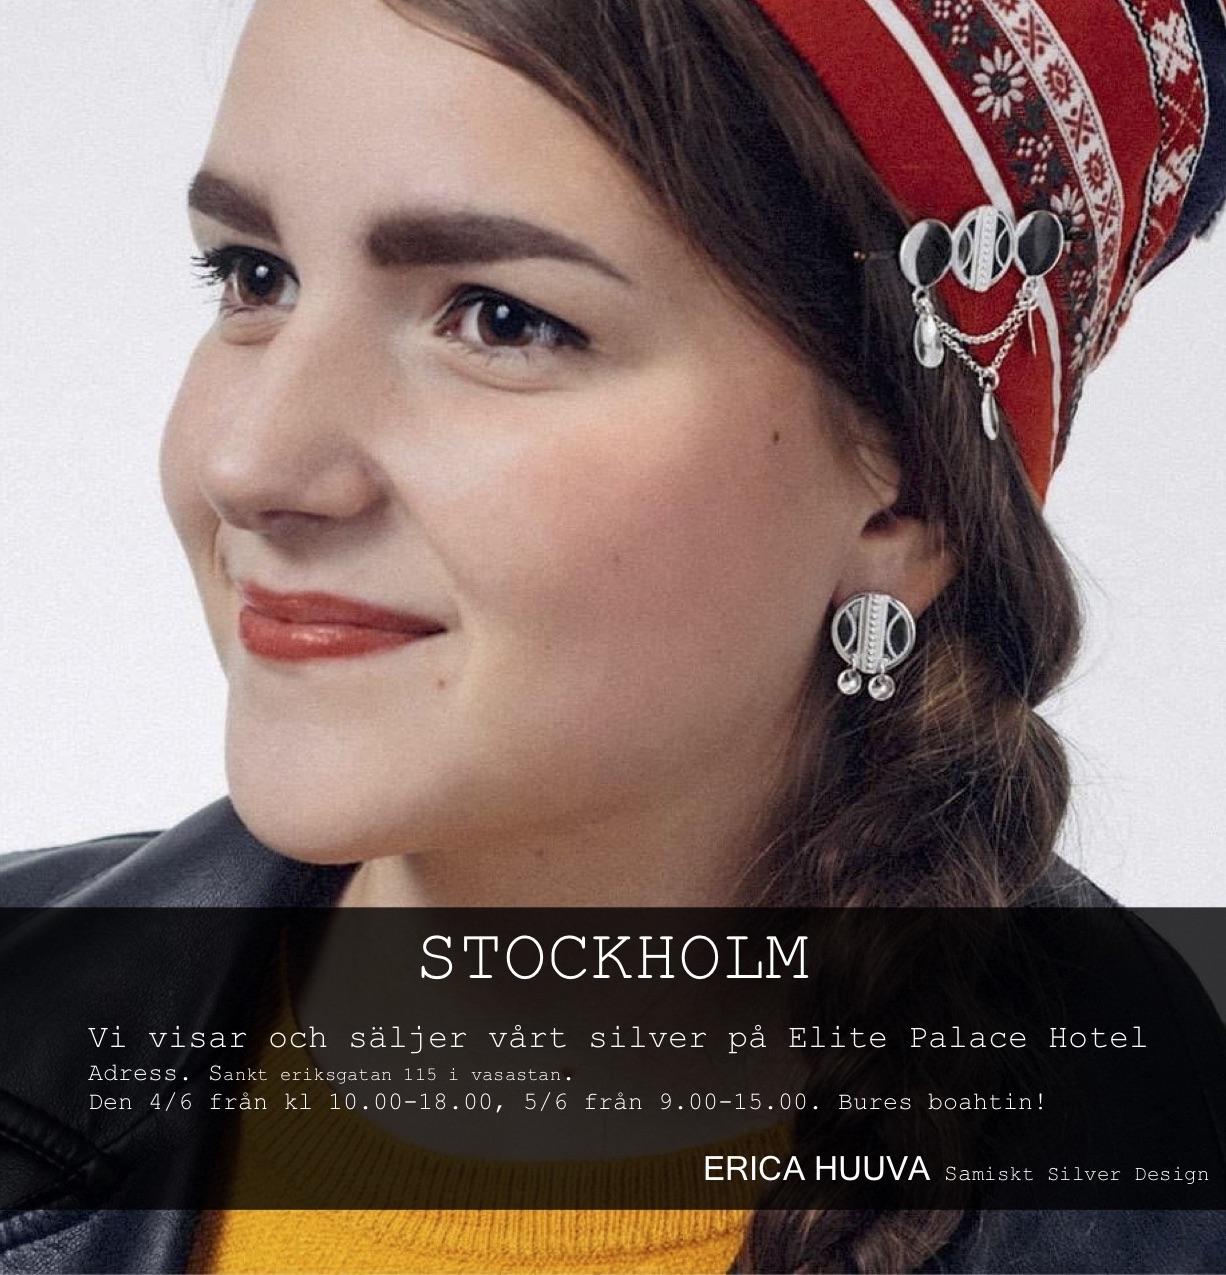 Erica Huuvas silversmycken i Stockholm